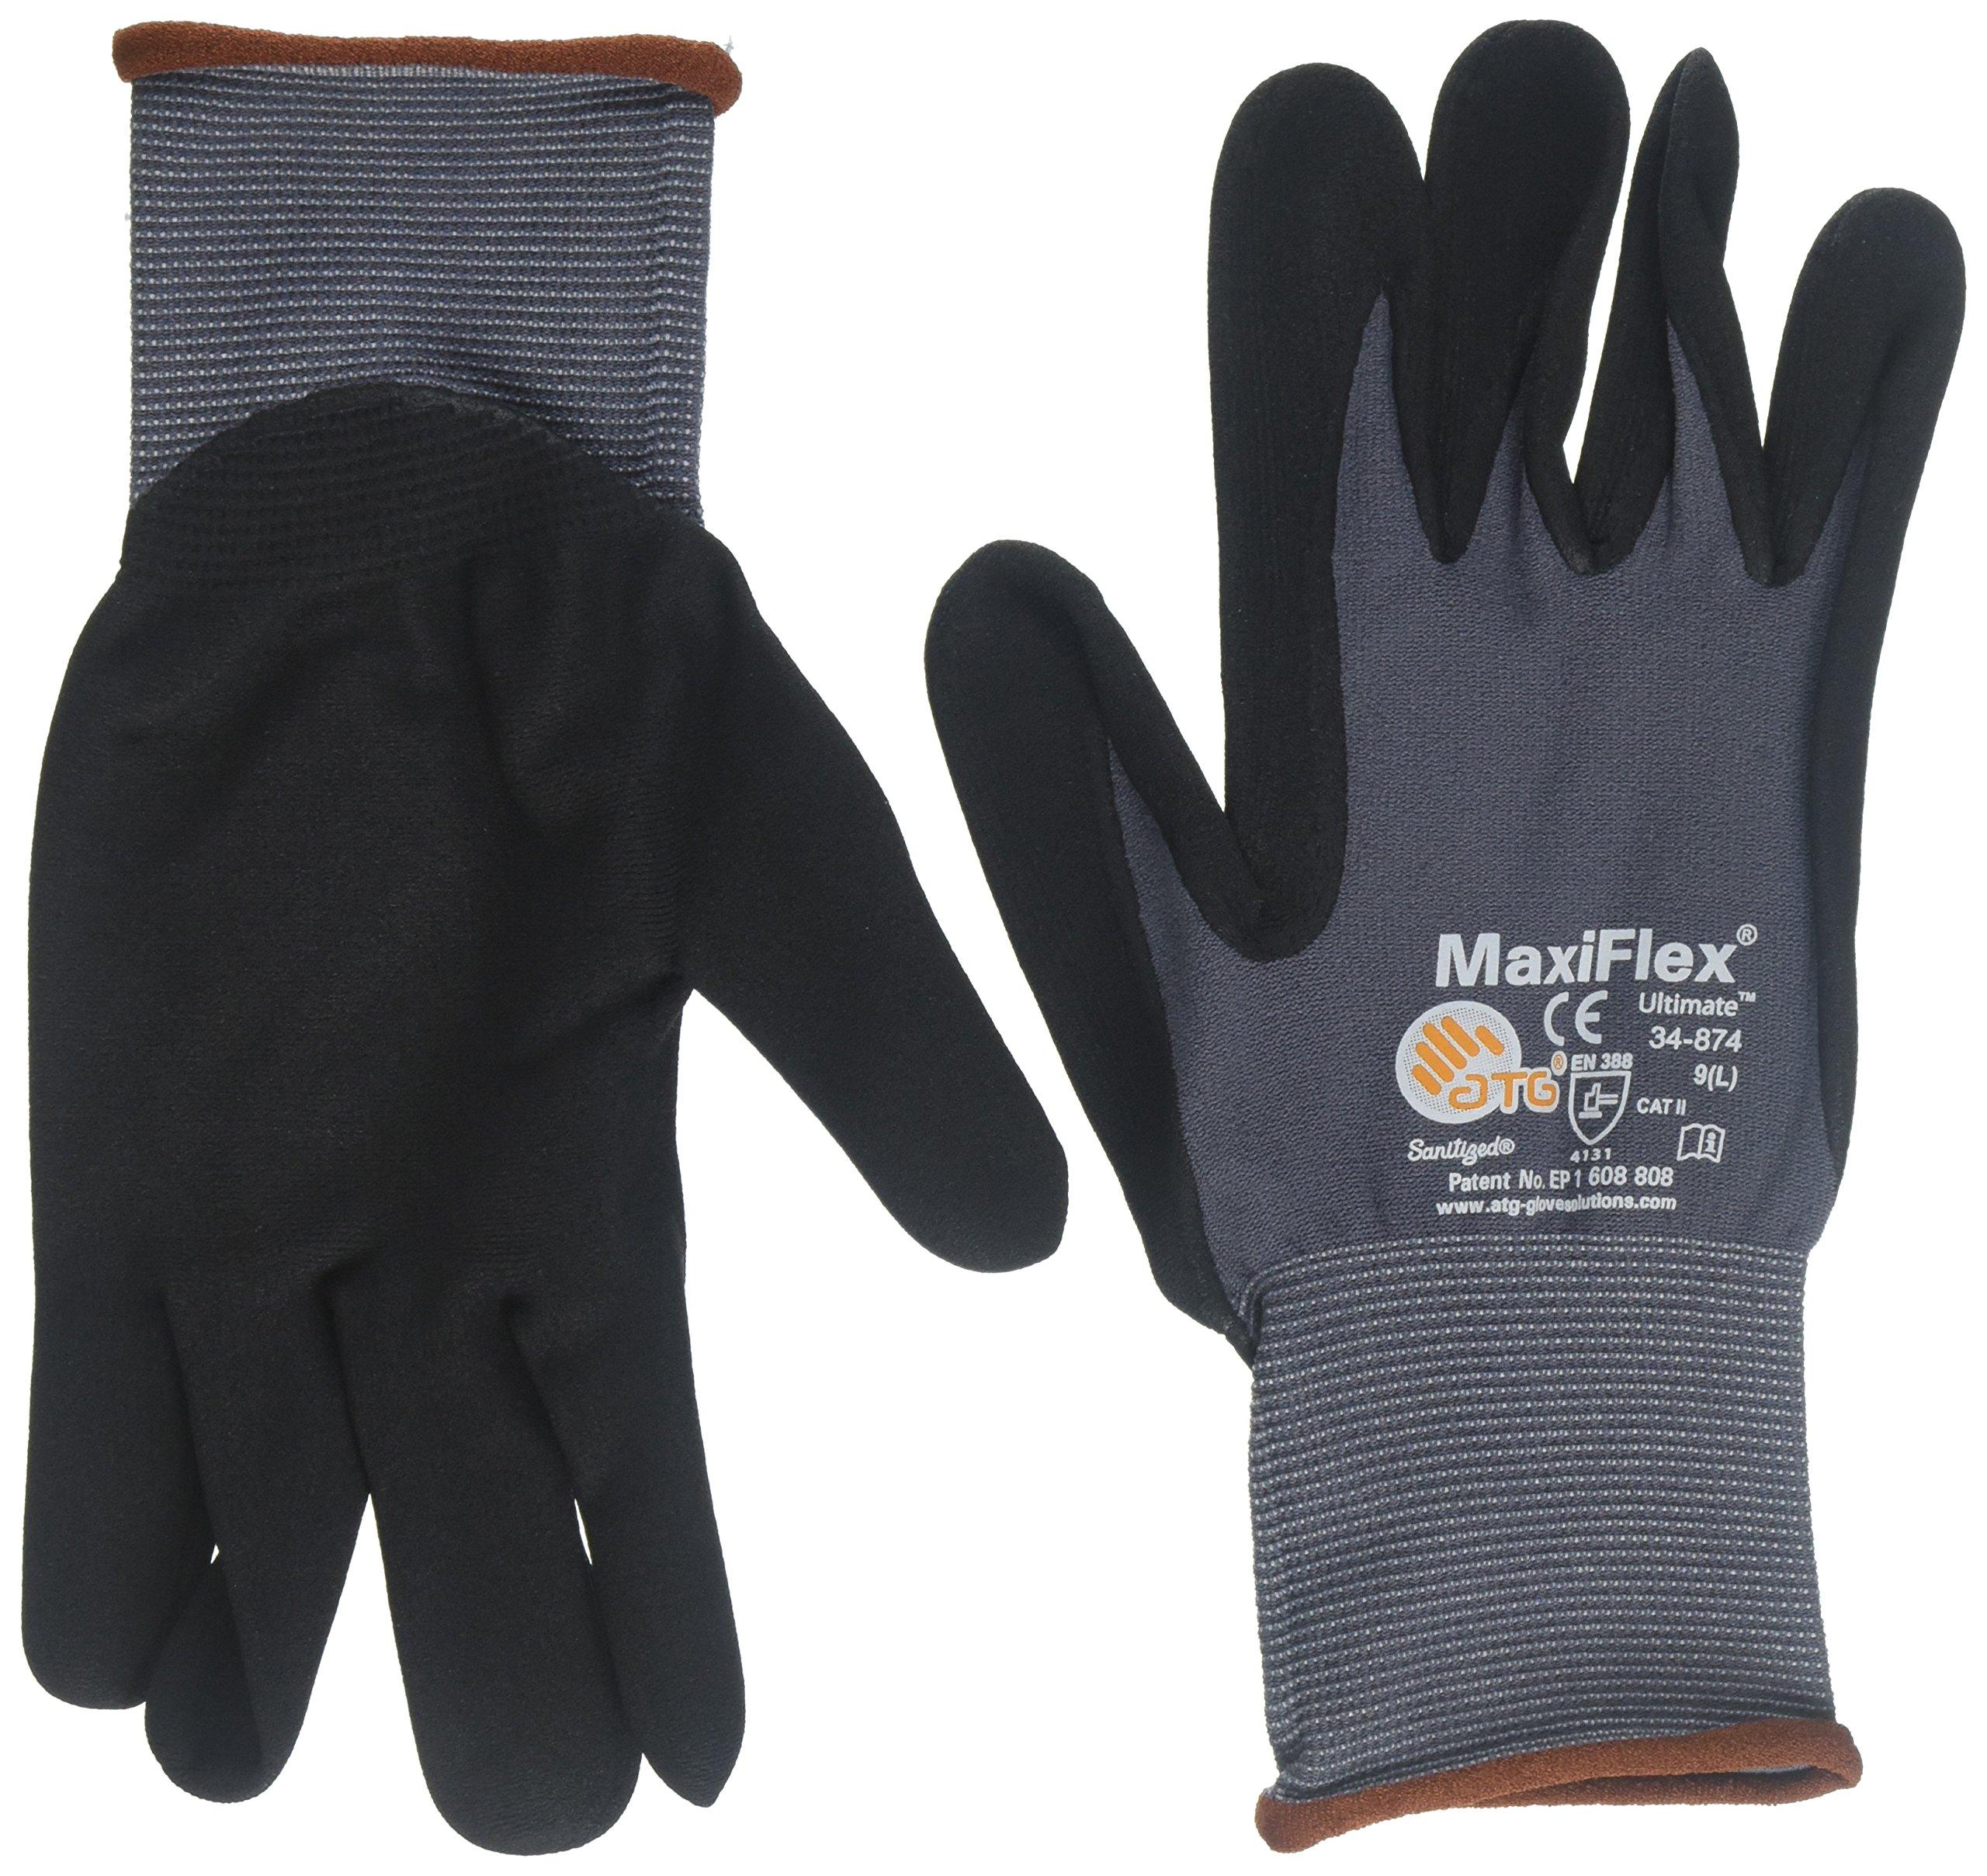 PIP ATG MaxiFlex 34-874 Grey/Black Large Nylon Full Fingered General Purpose Gloves - Nitrile/Nitrile Foam Palm & Fingers Coating - 8.7 in Length - Seamless Knit - 616314-21548 [Price is per Dozen]